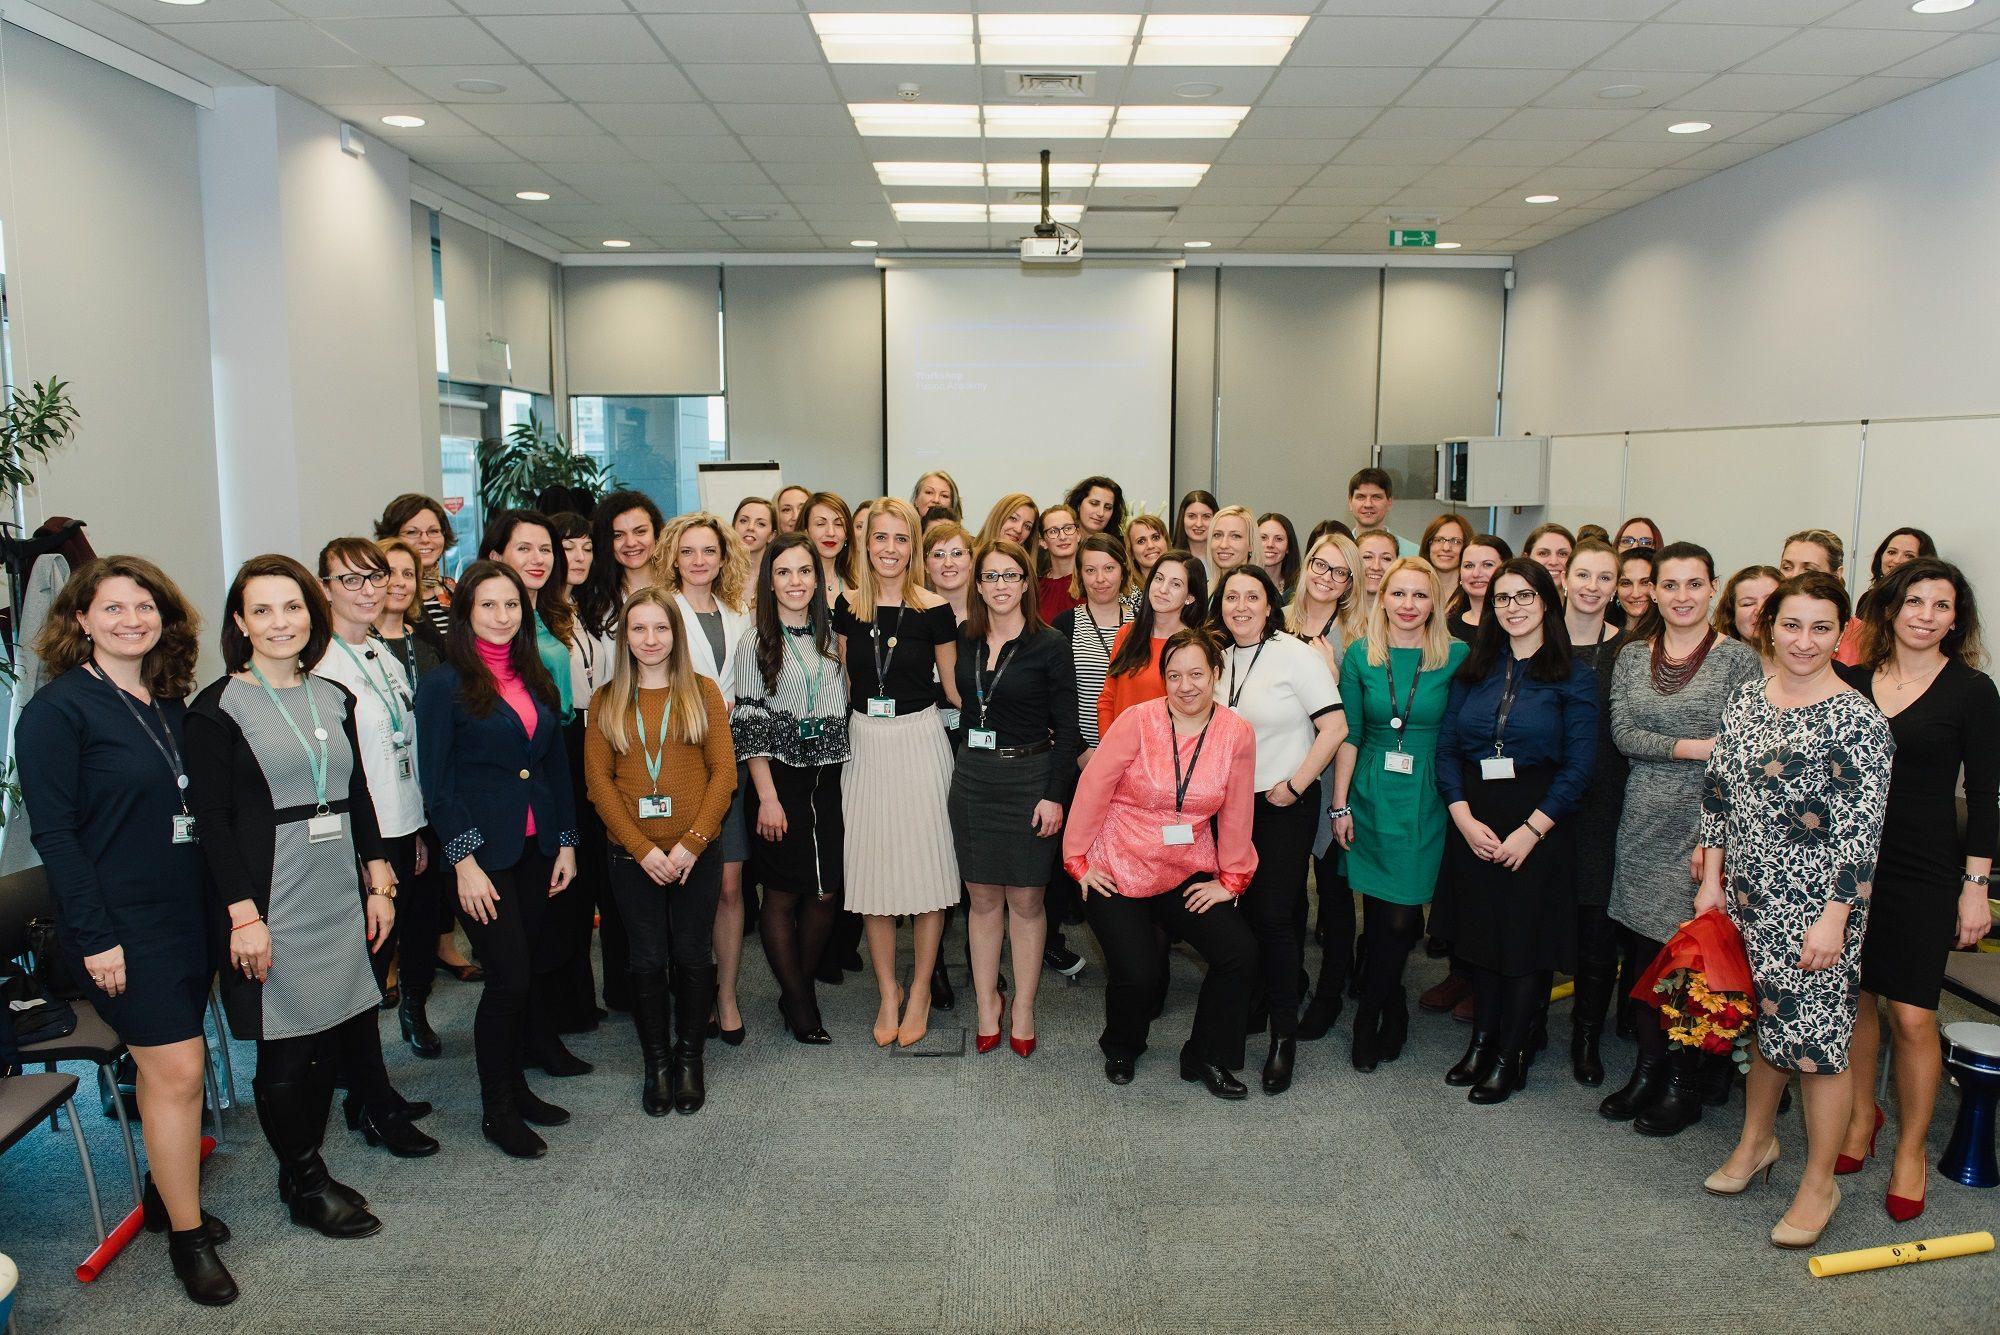 Al Participants at the Women at Work Bulgaria Talent Event